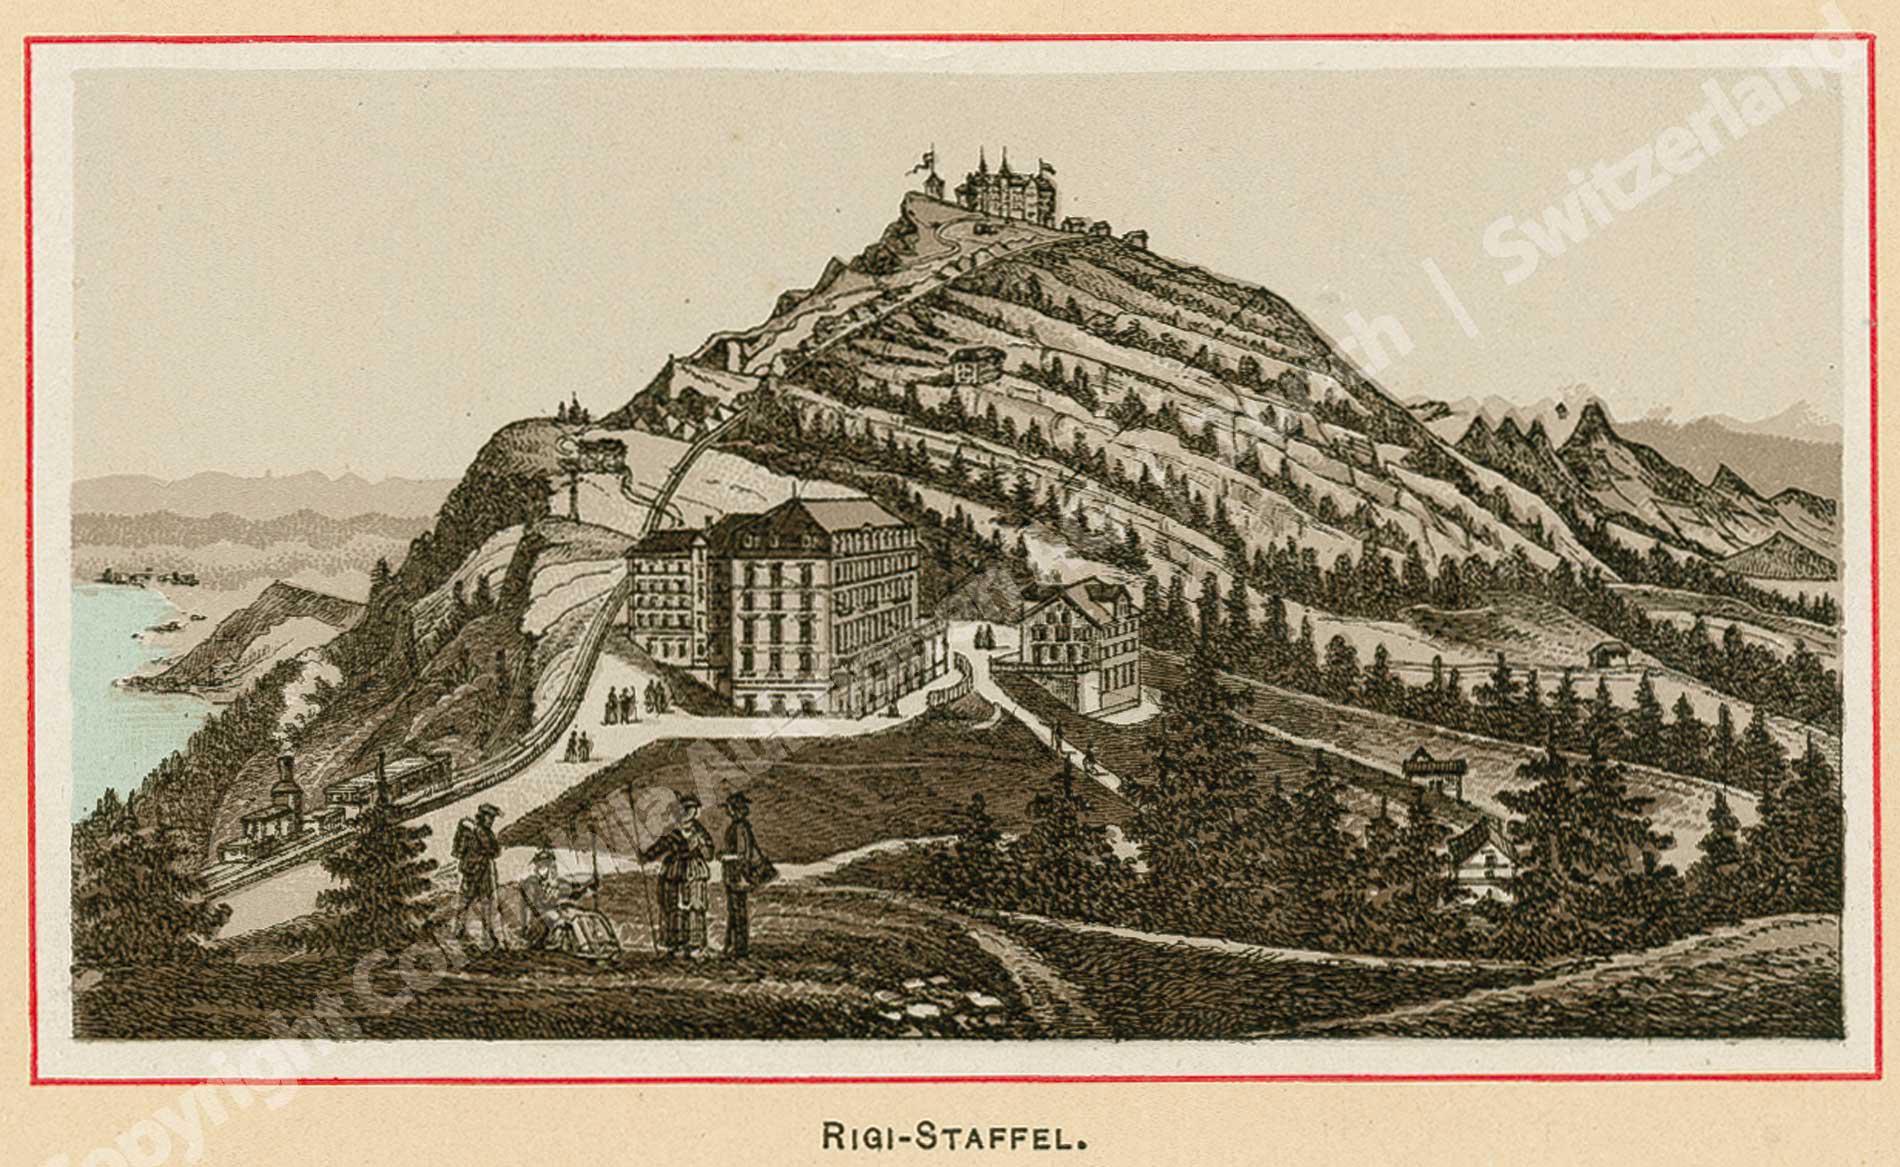 Rigi Staffel